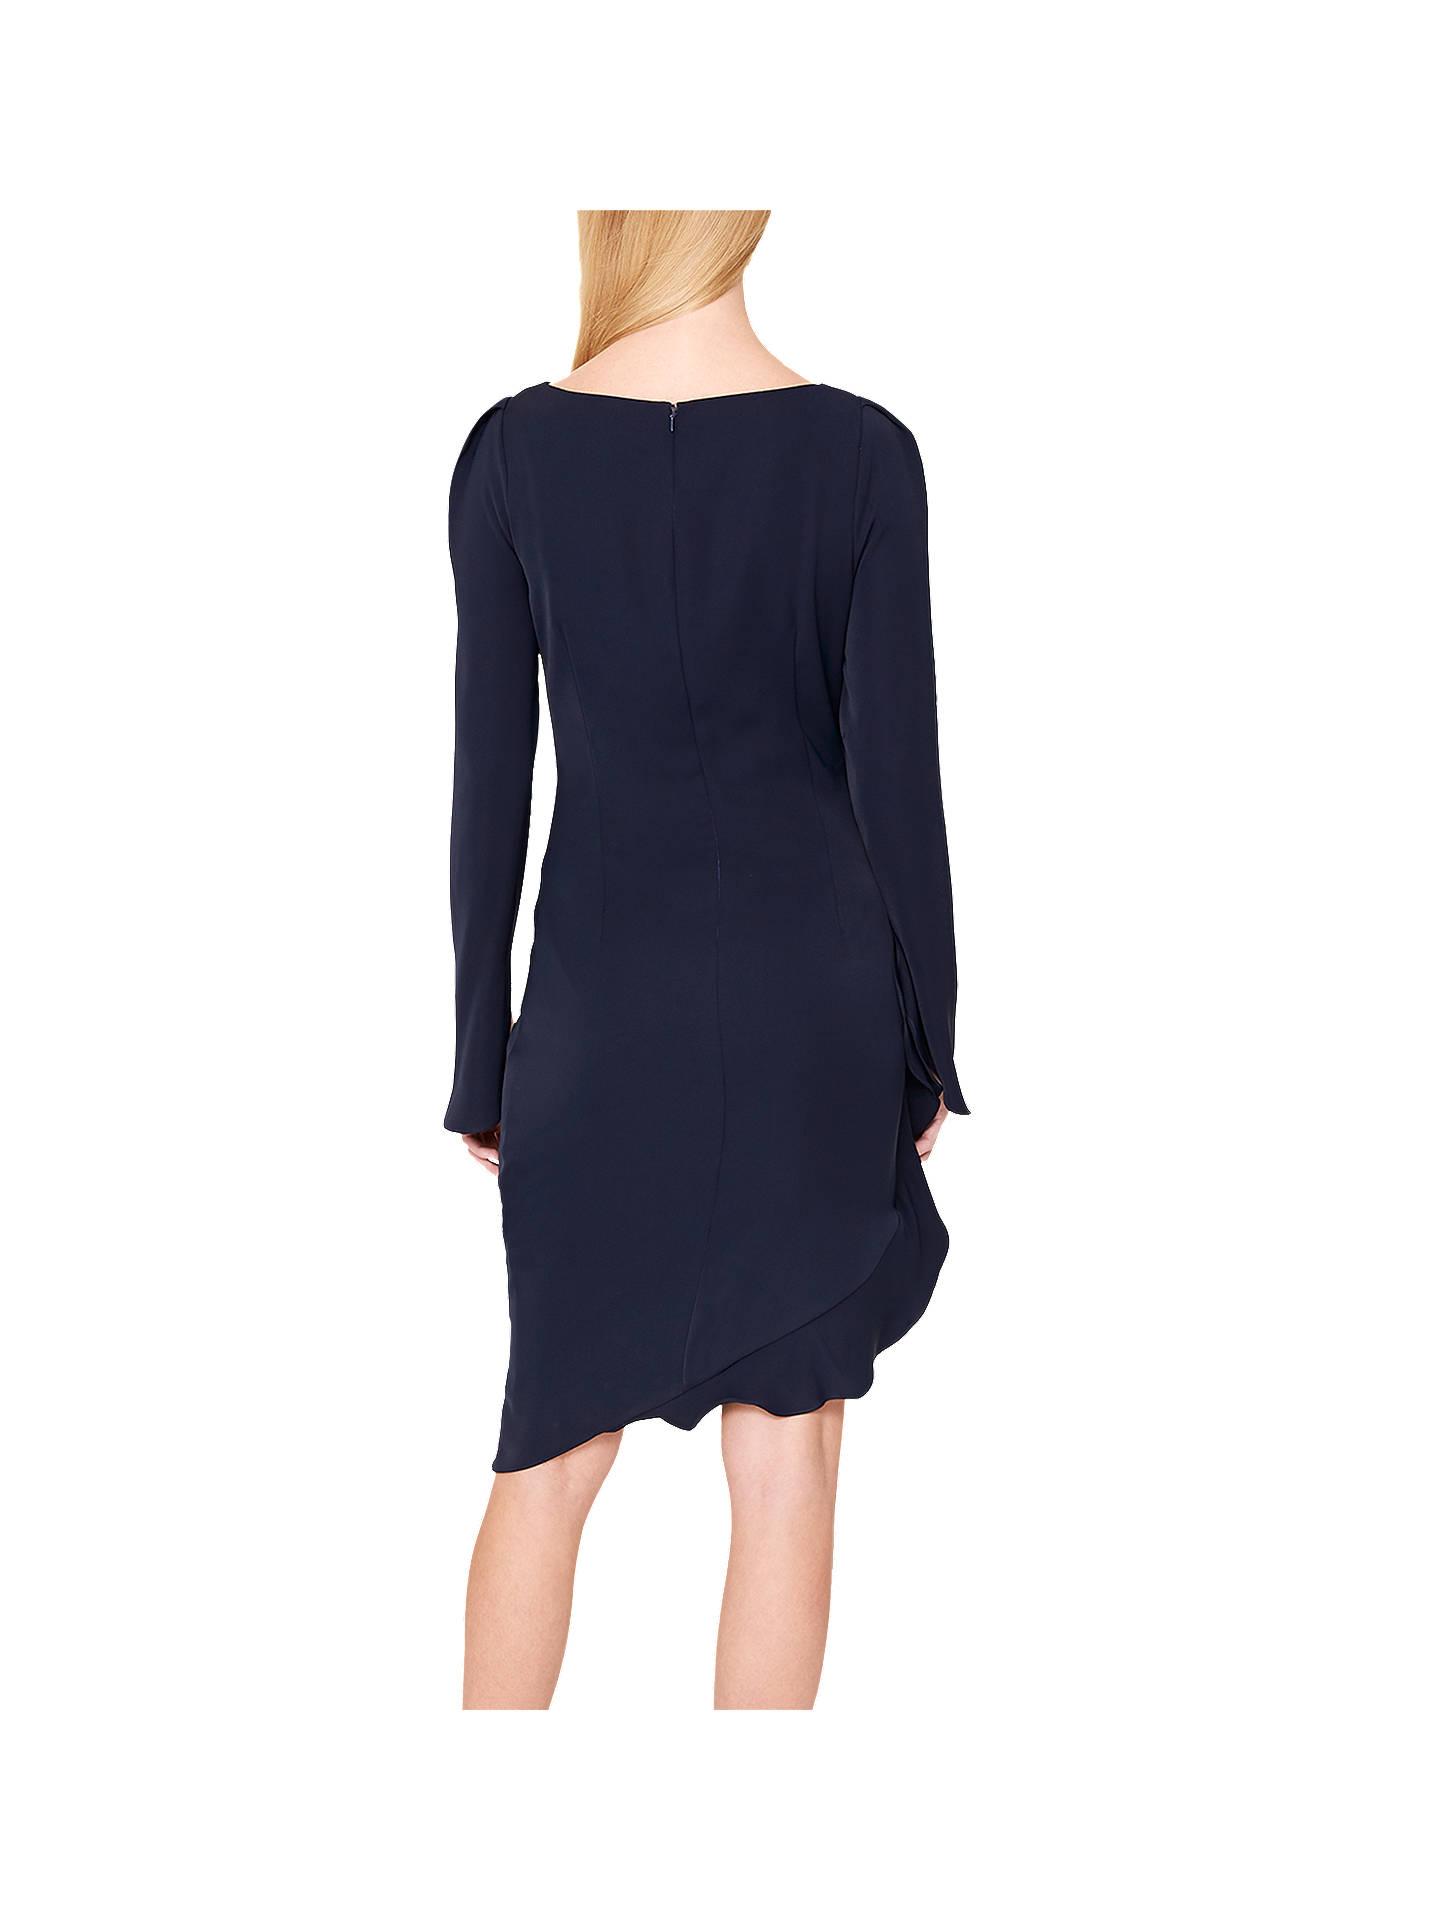 895b4cd3c39 ... Buy Damsel in a Dress Carrera Frill Tunic Dress, Navy, 14 Online at  johnlewis ...